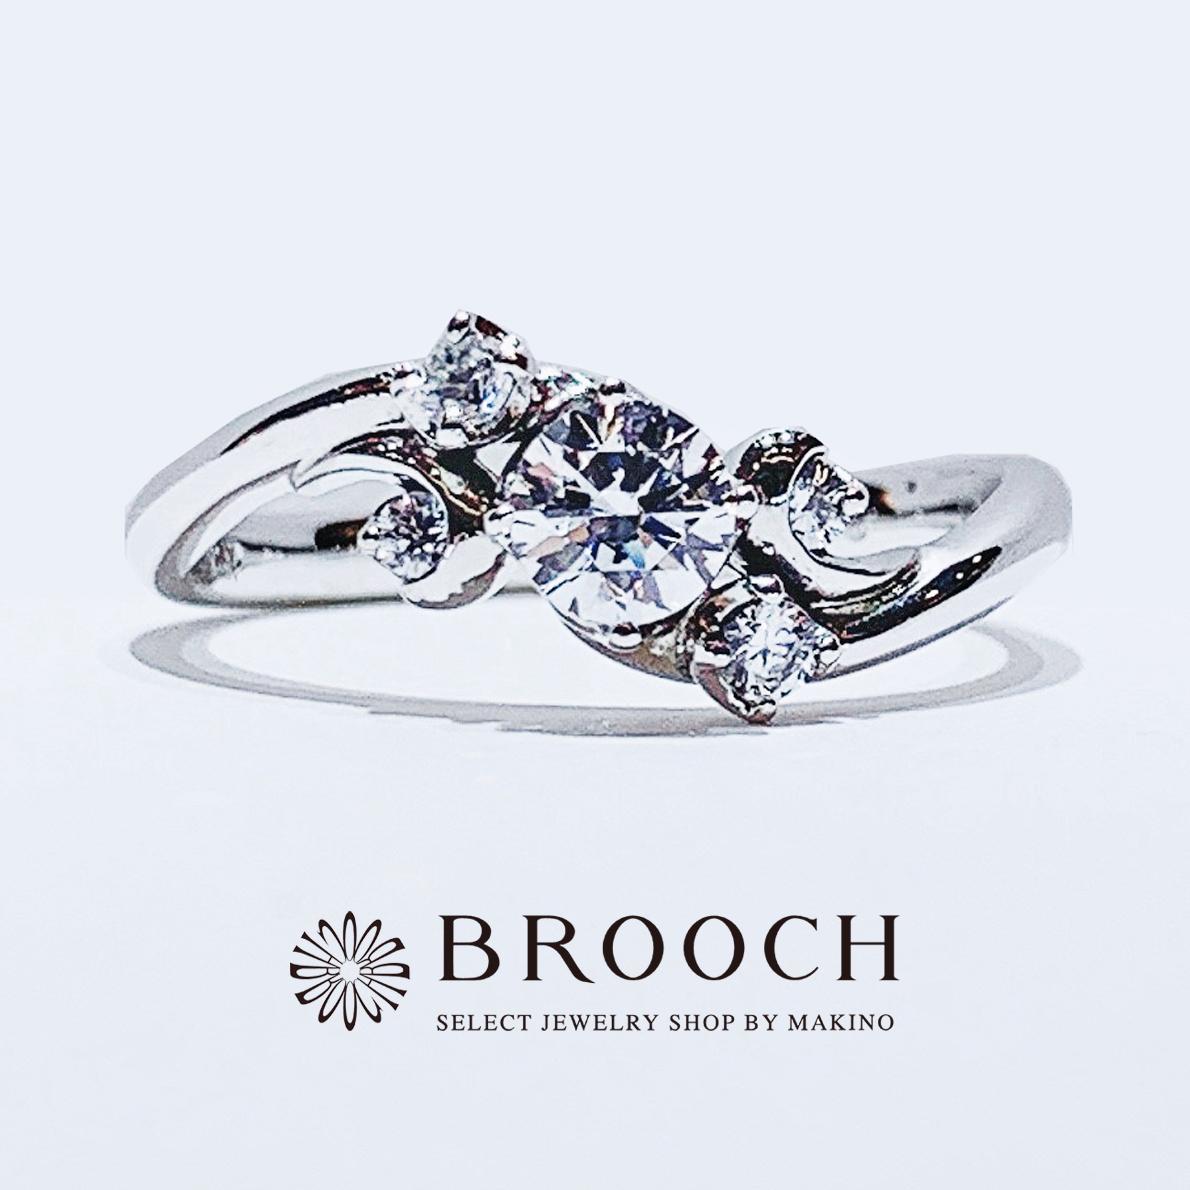 BROOCH 婚約指輪 エンゲージリング かわいい 華やかなウェーブデザイン